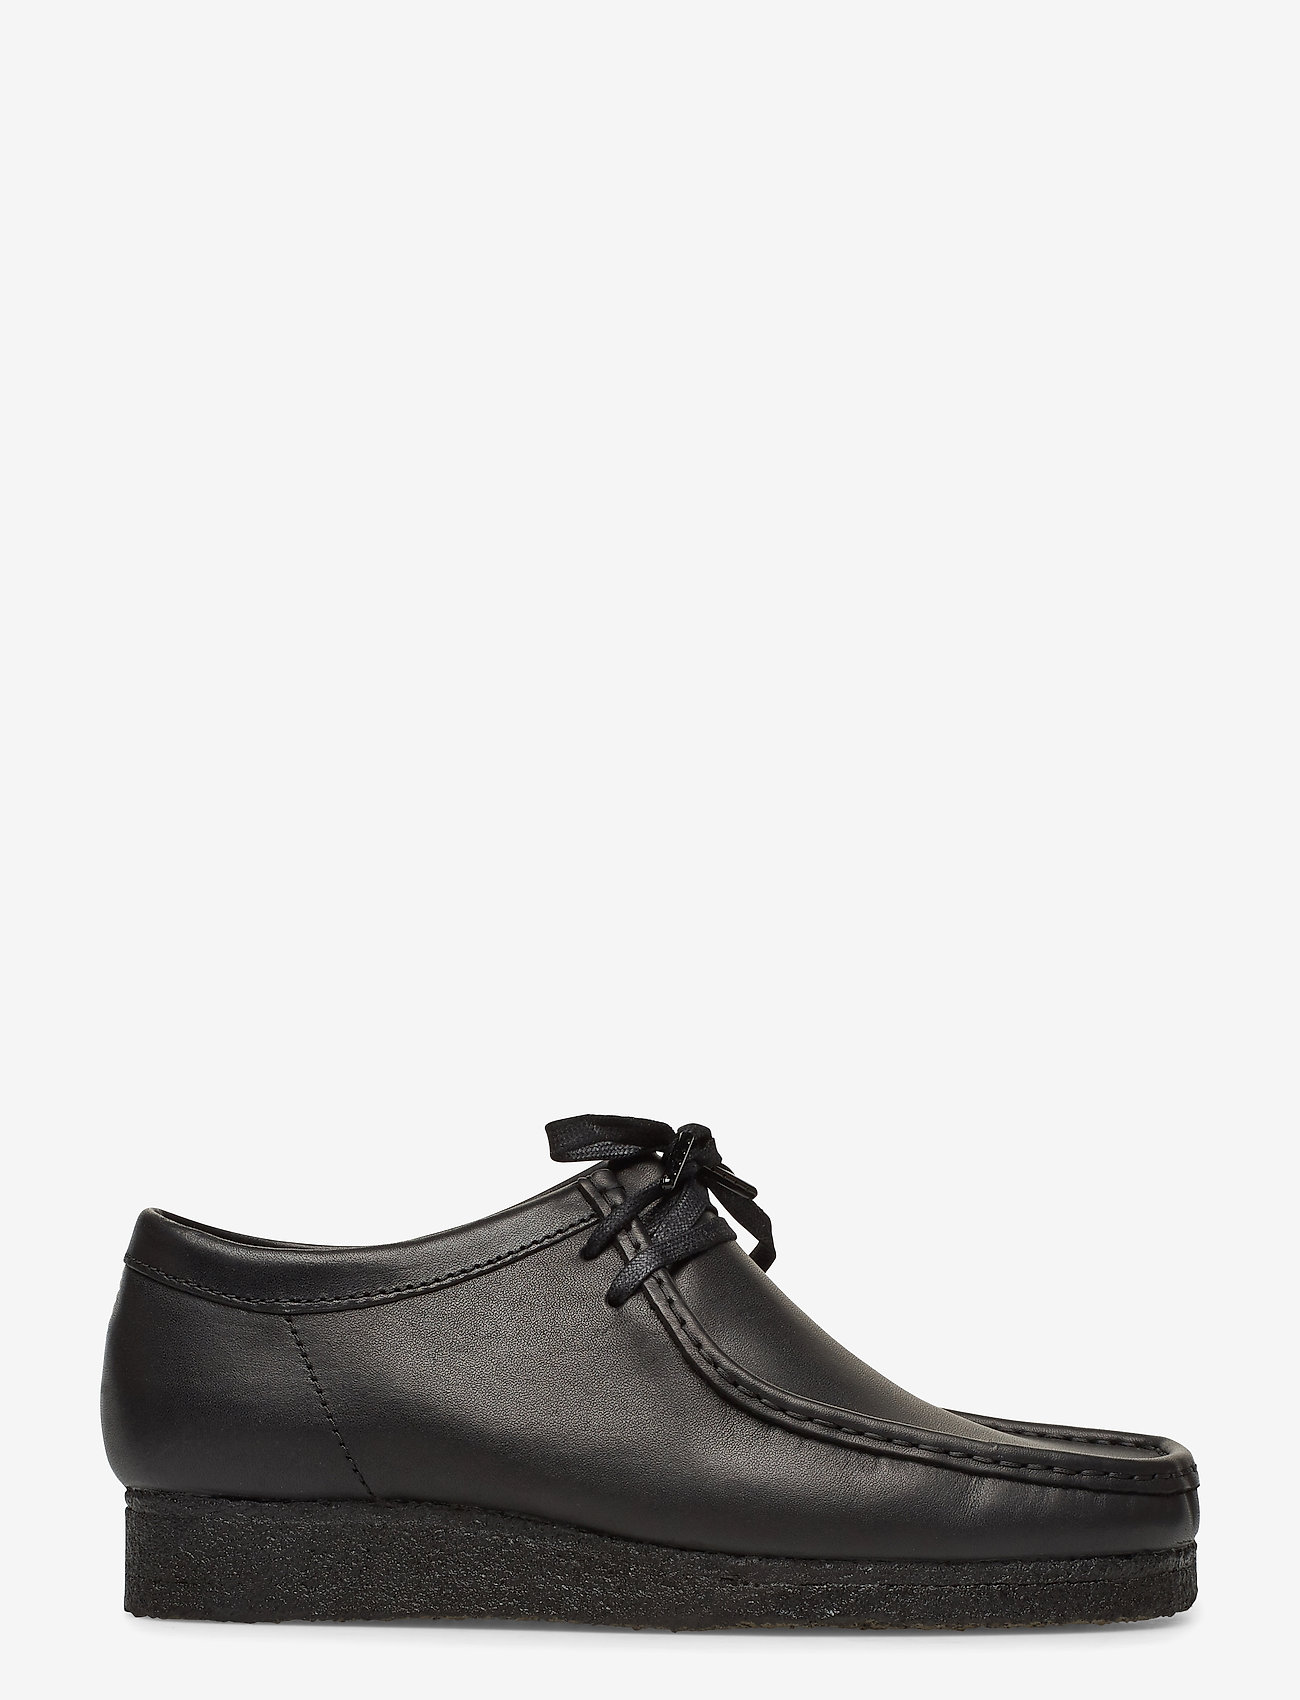 Clarks Originals - Wallabee - snörskor - black leather - 1